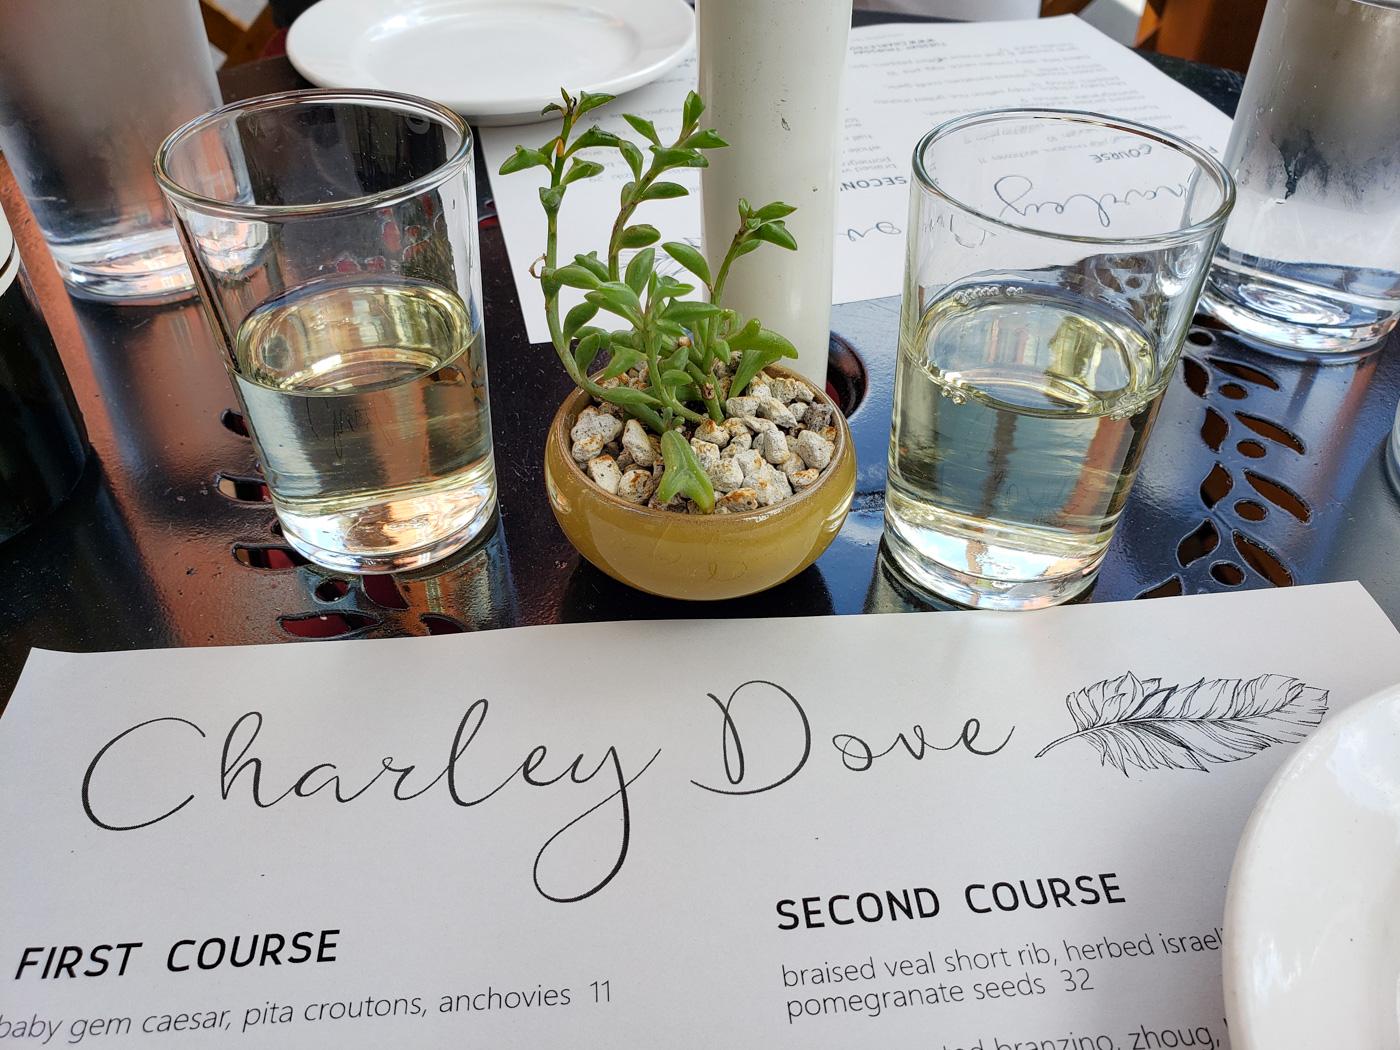 Dinner at Charley Dove